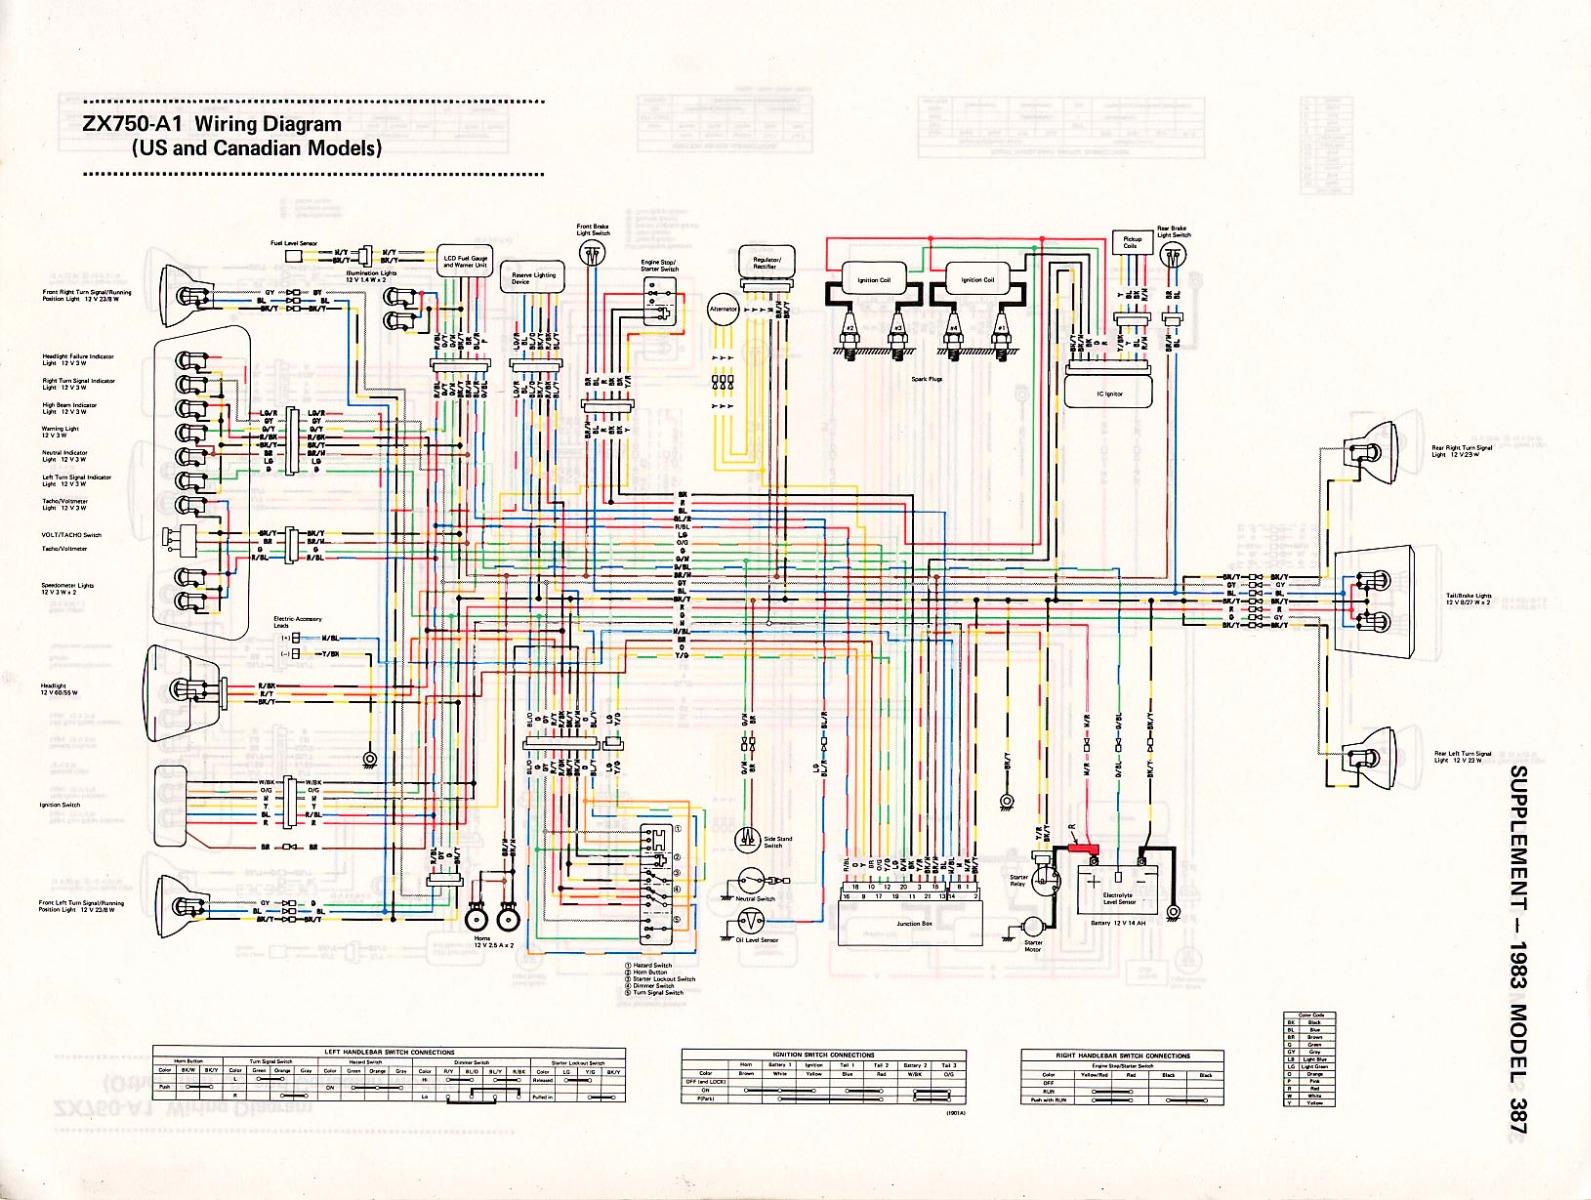 hight resolution of 1983 kawasaki gpz 750 wiring diagram wiring diagram experts 1983 kawasaki wiring diagram